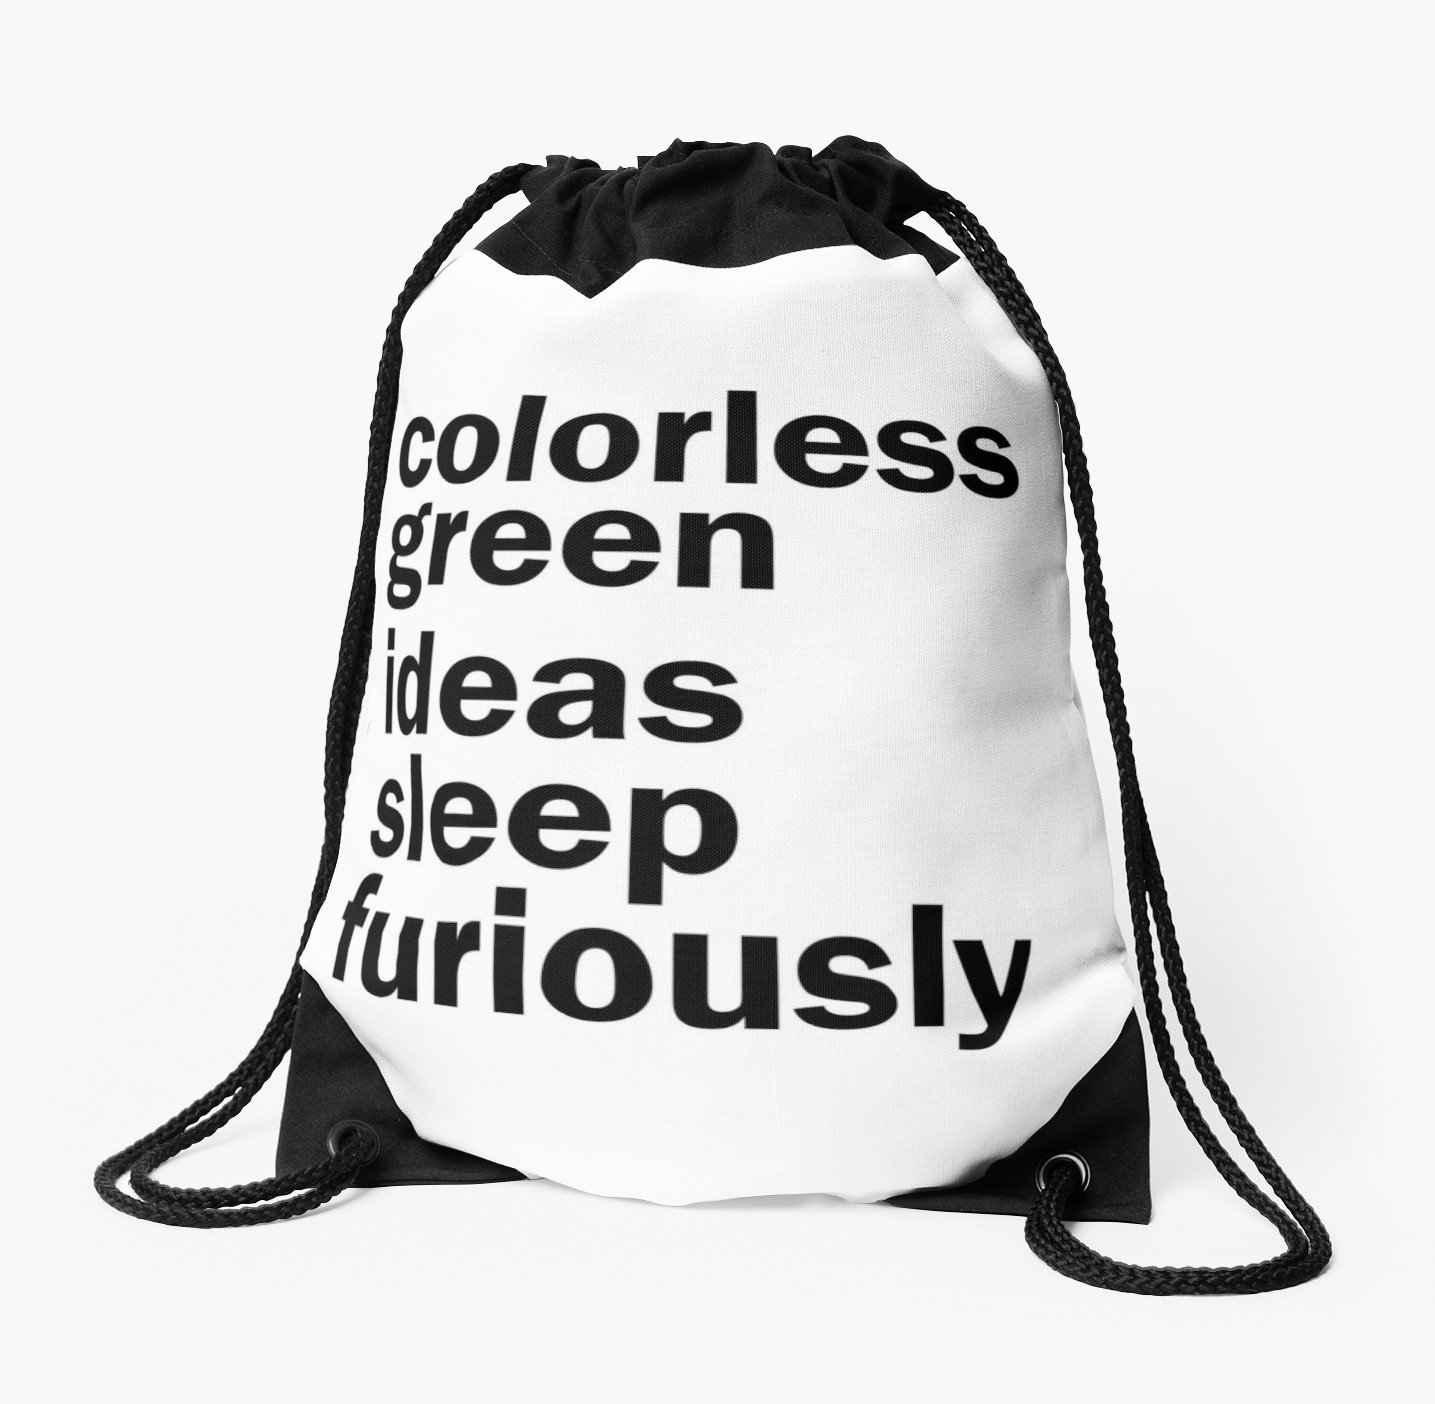 10 Gorgeous Colorless Green Ideas Sleep Furiously colorless green ideas sleep furiously white linguistics 2021